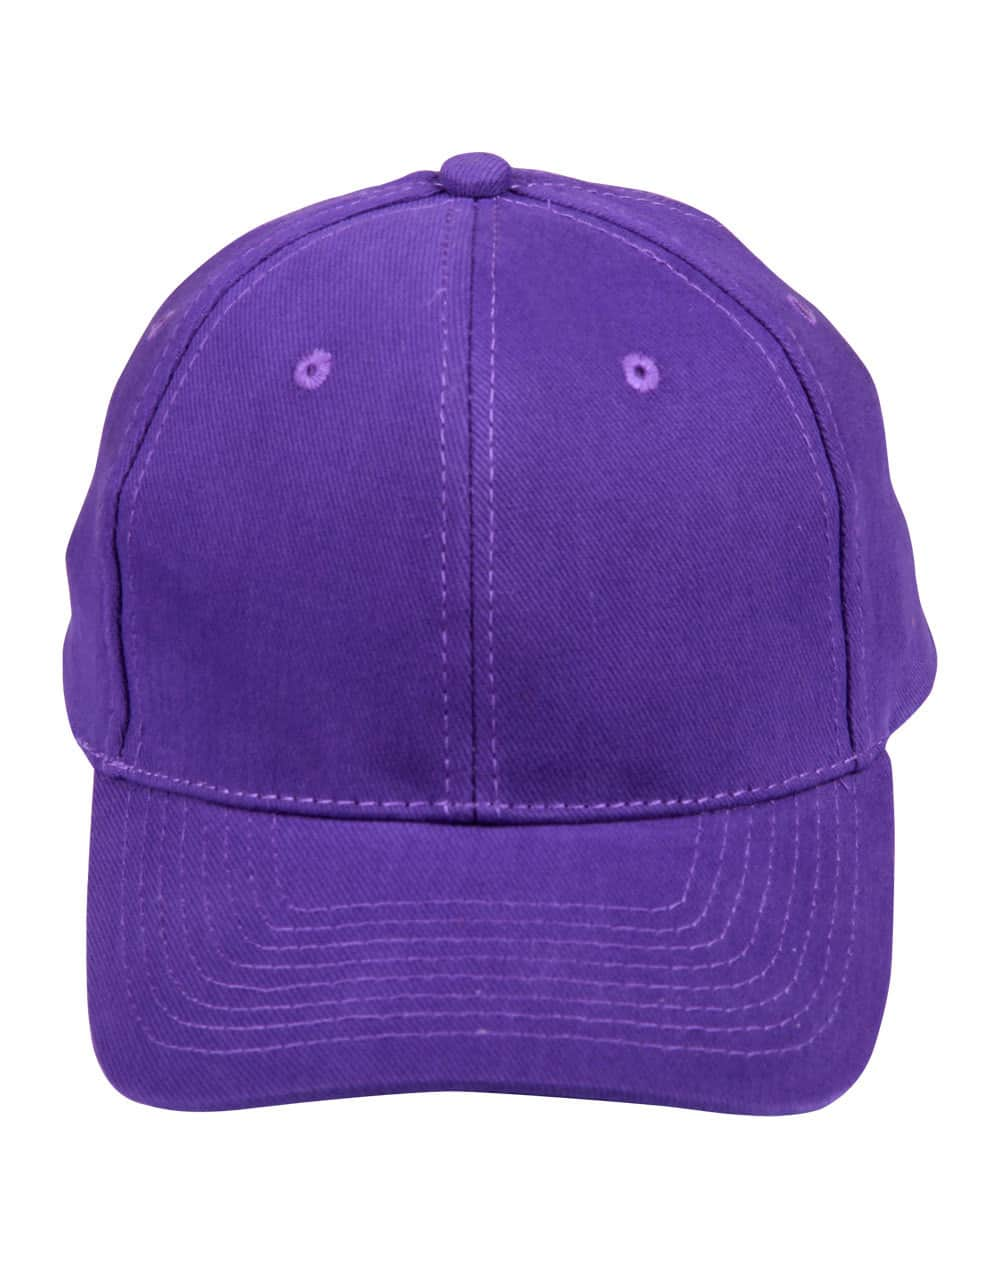 Purple Heavy Brushed Cotton Cap